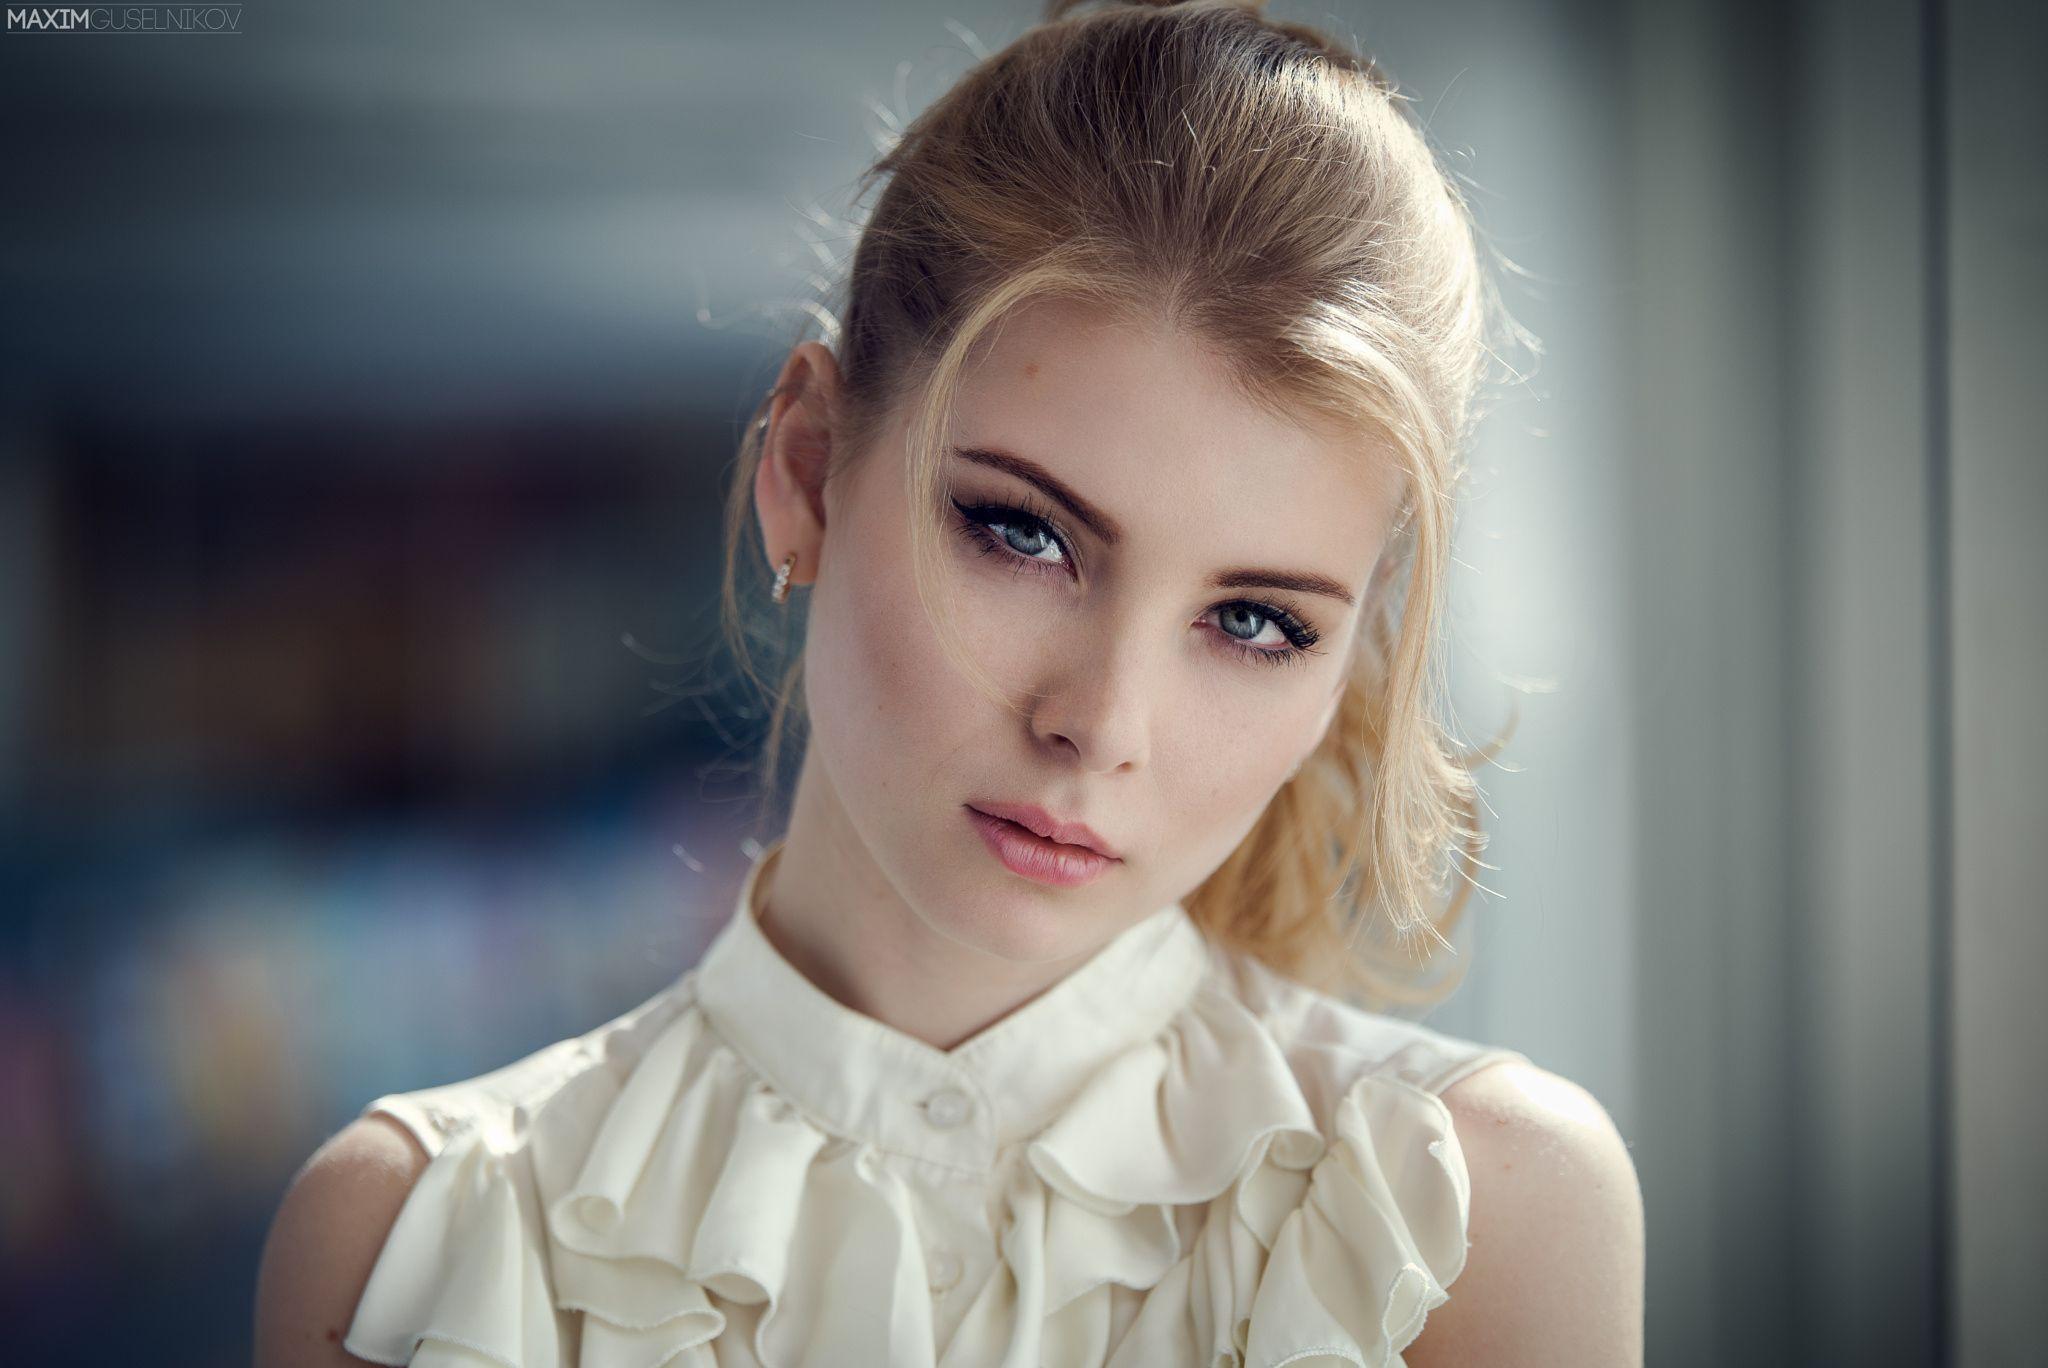 Selfie Irina Ioana Baian nude photos 2019